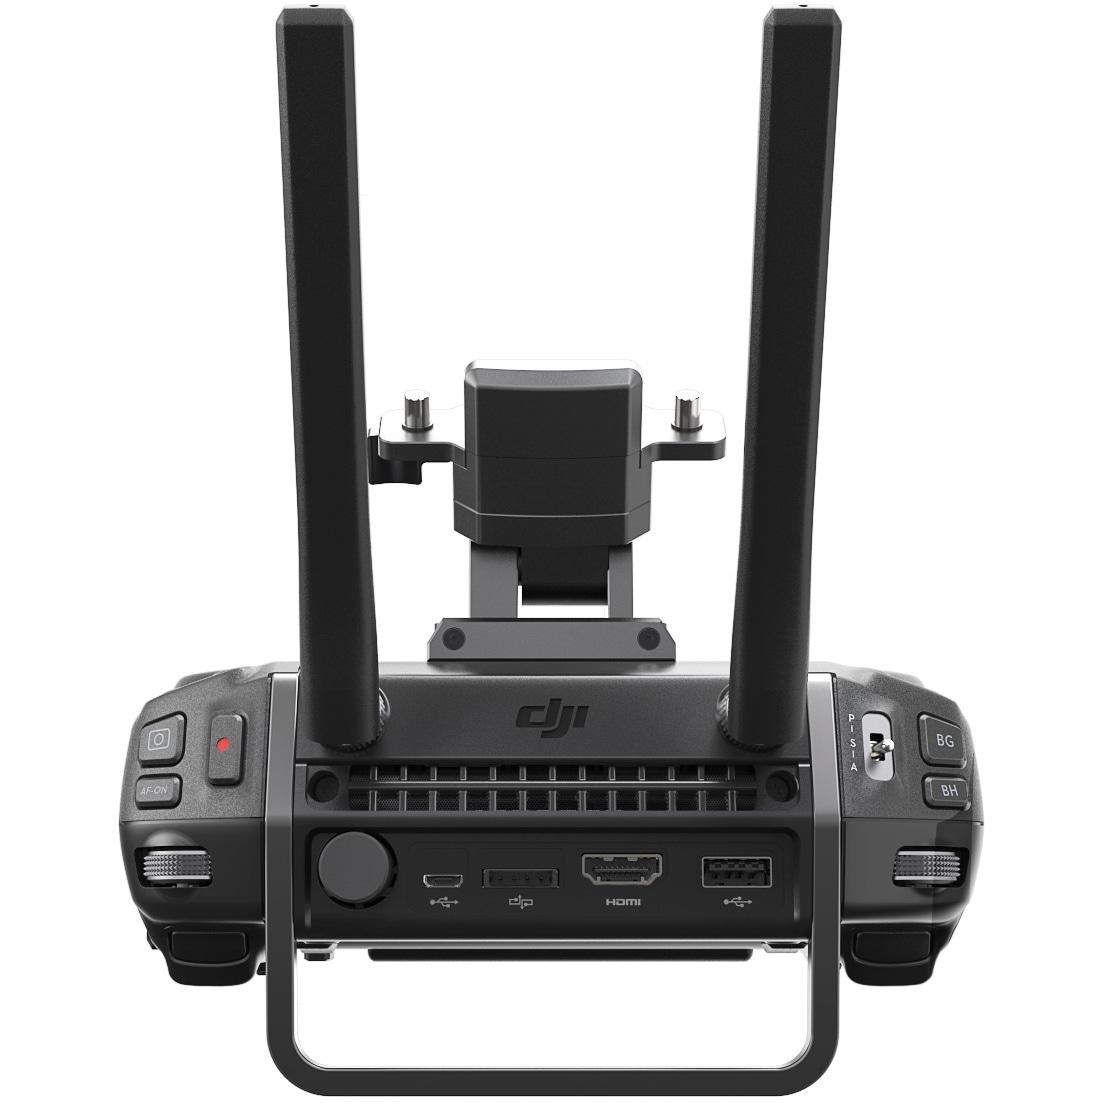 Пульт ДУ DJI Cendence Remote Controller-3